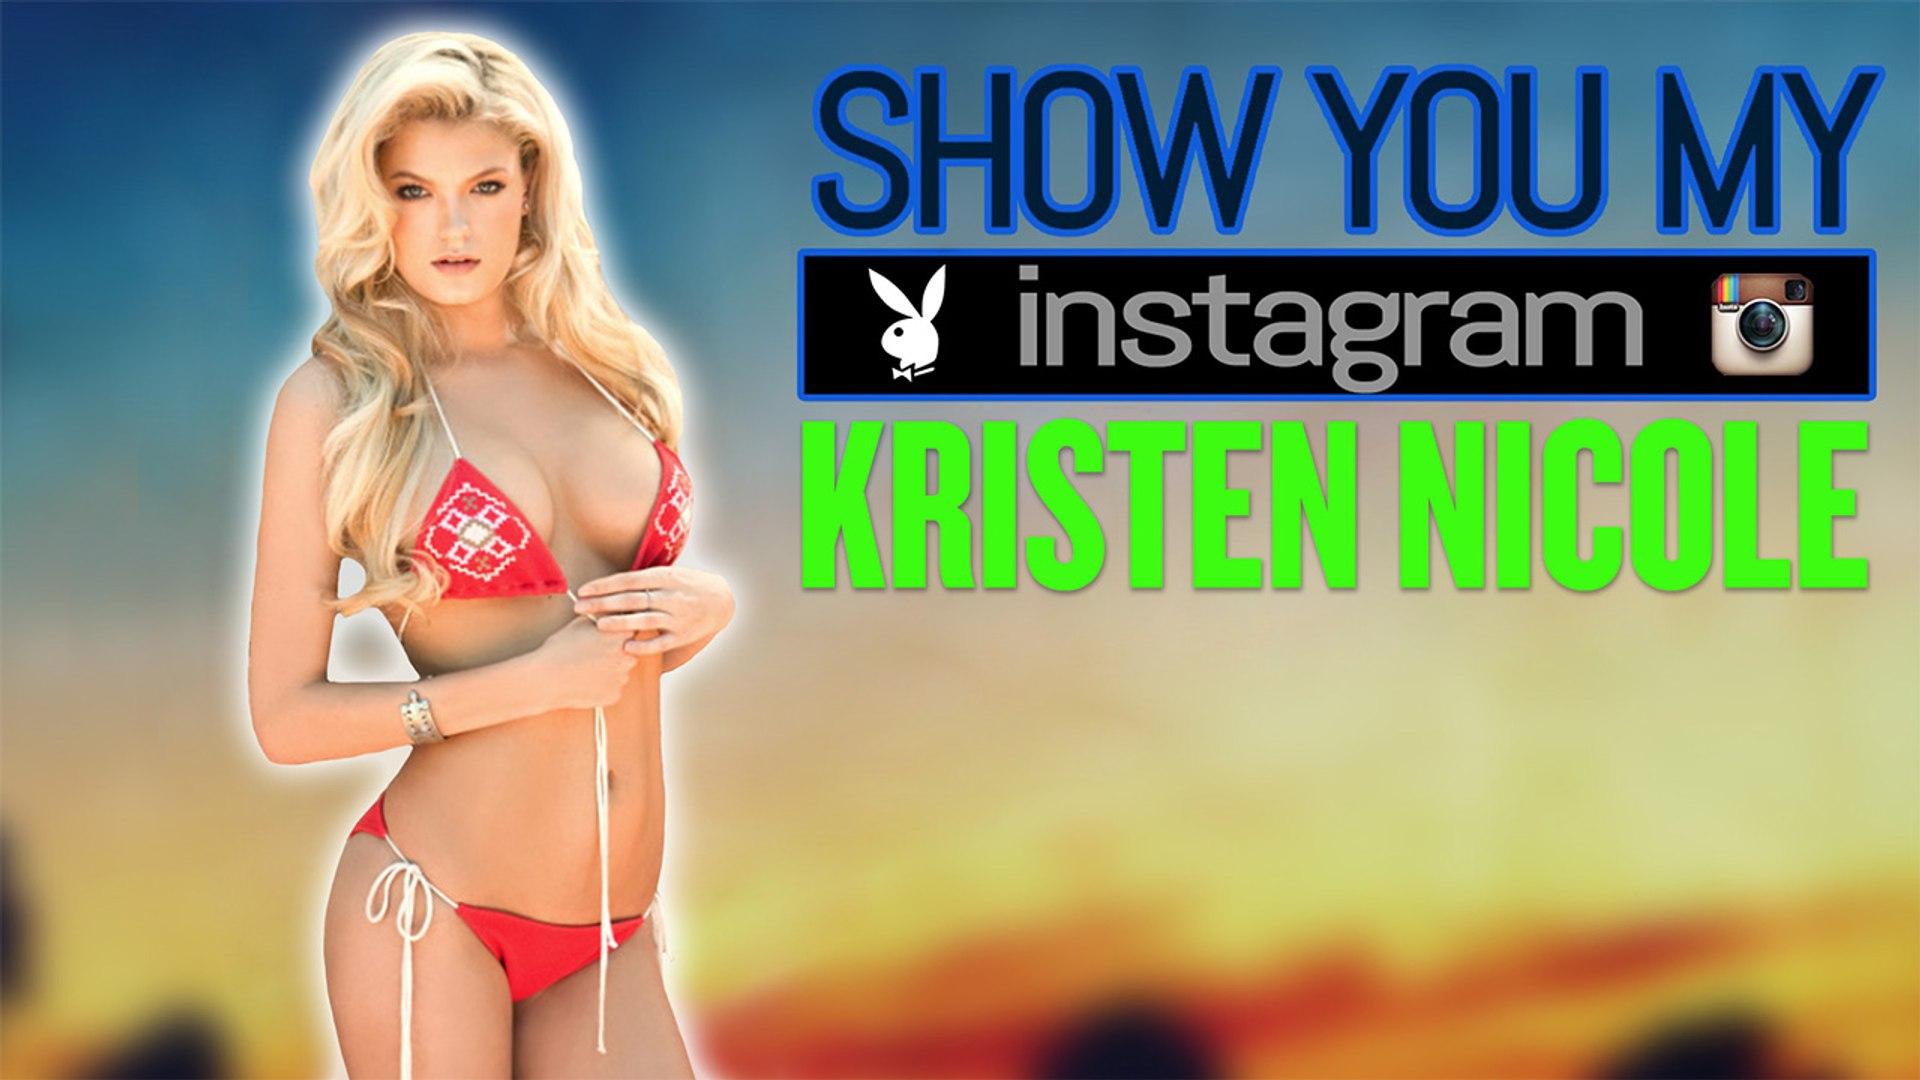 Playboy kristen nicole Kristen Nicole